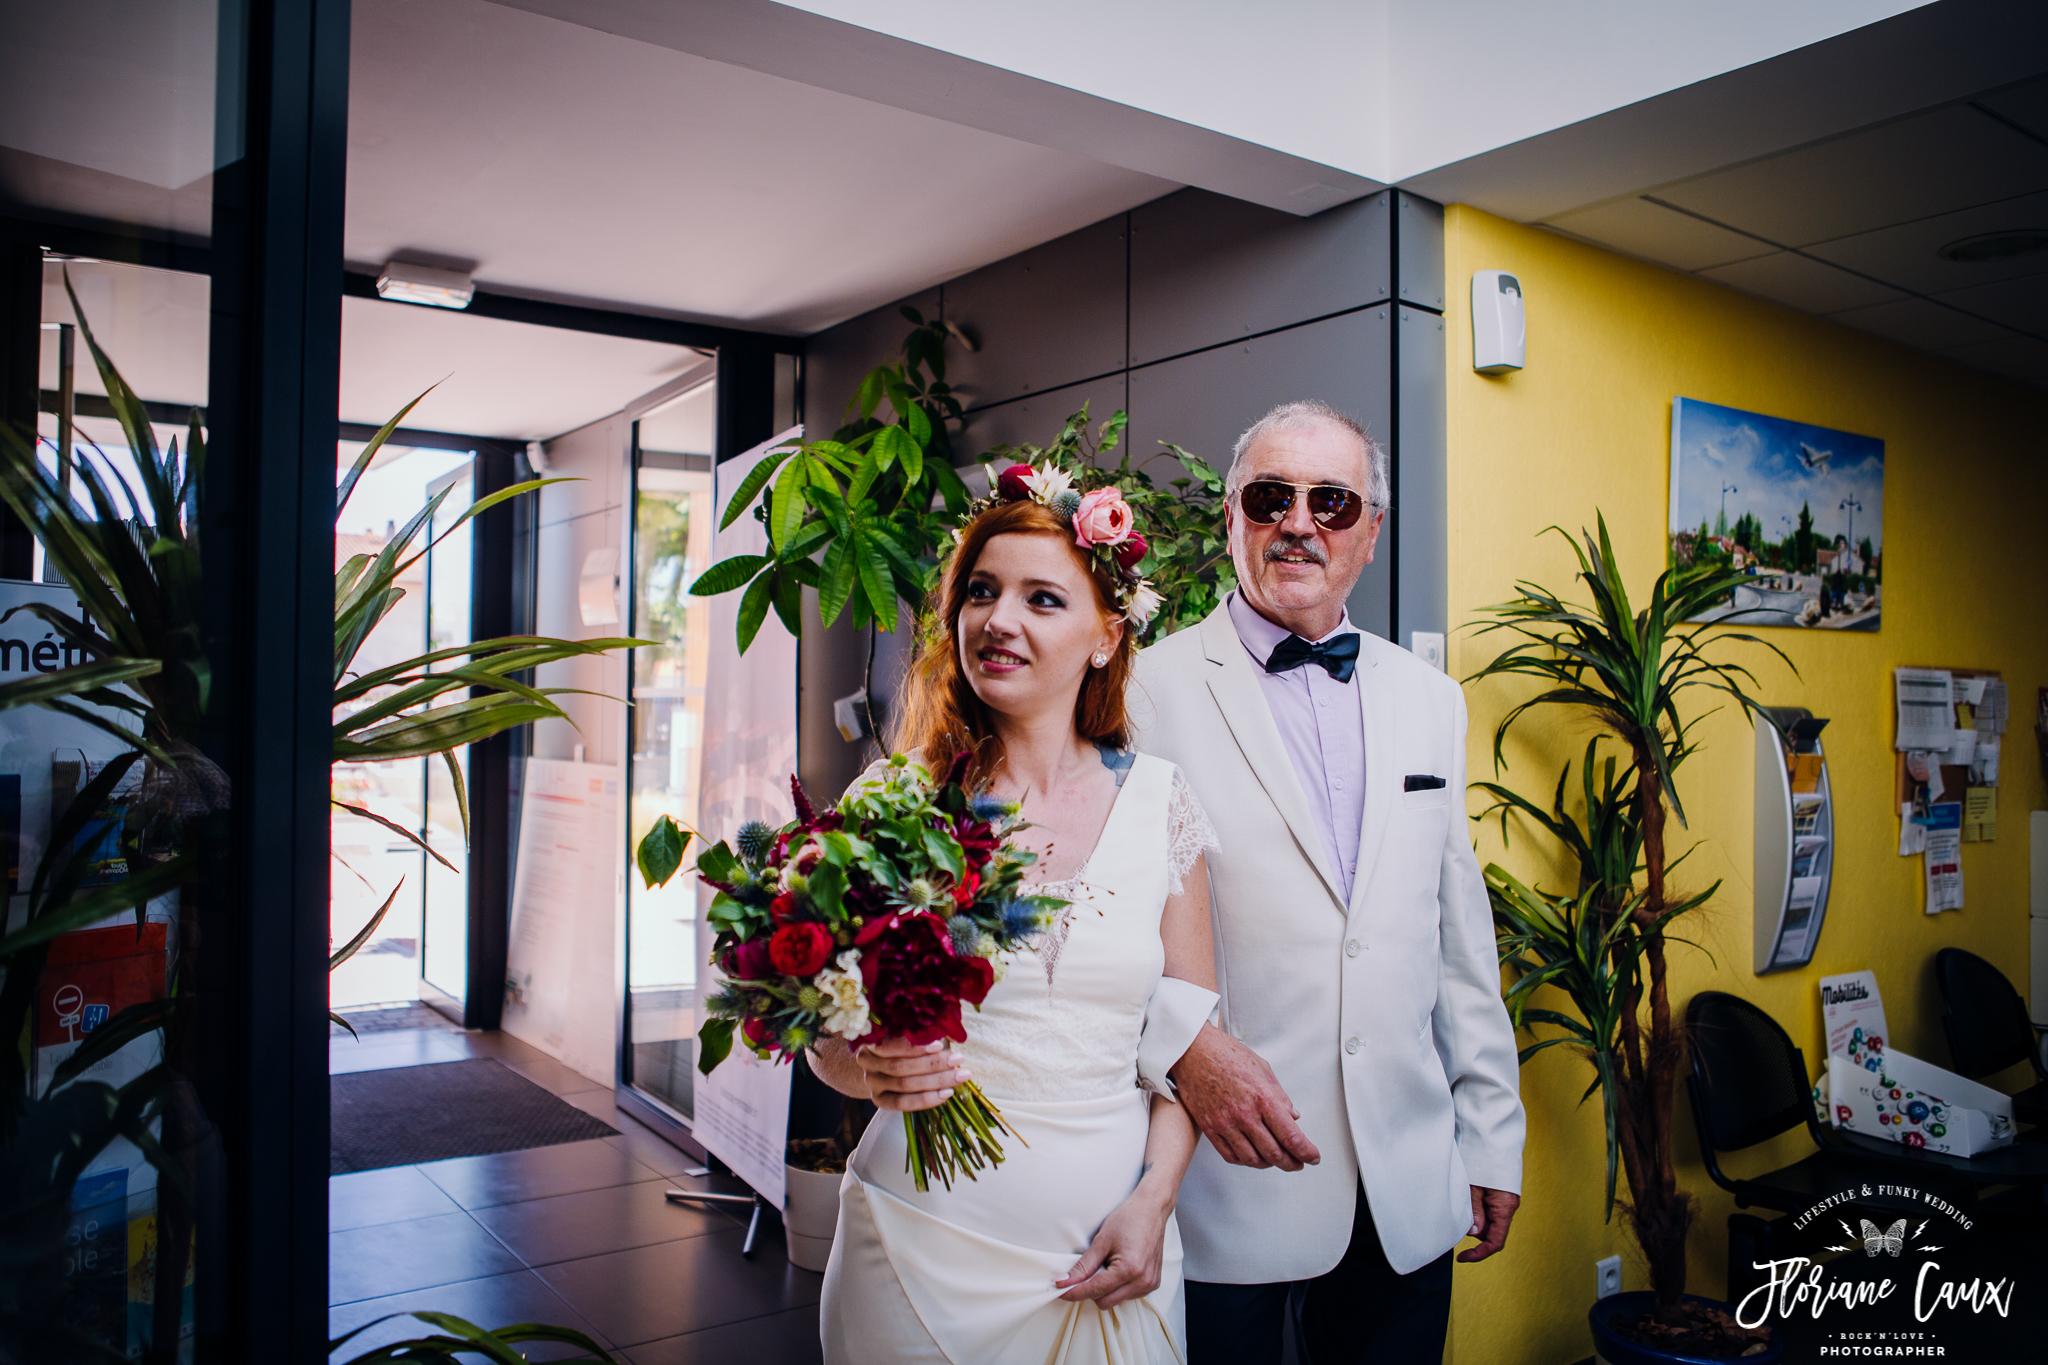 photographe-mariage-toulouse-rocknroll-maries-tatoues-floriane-caux-27